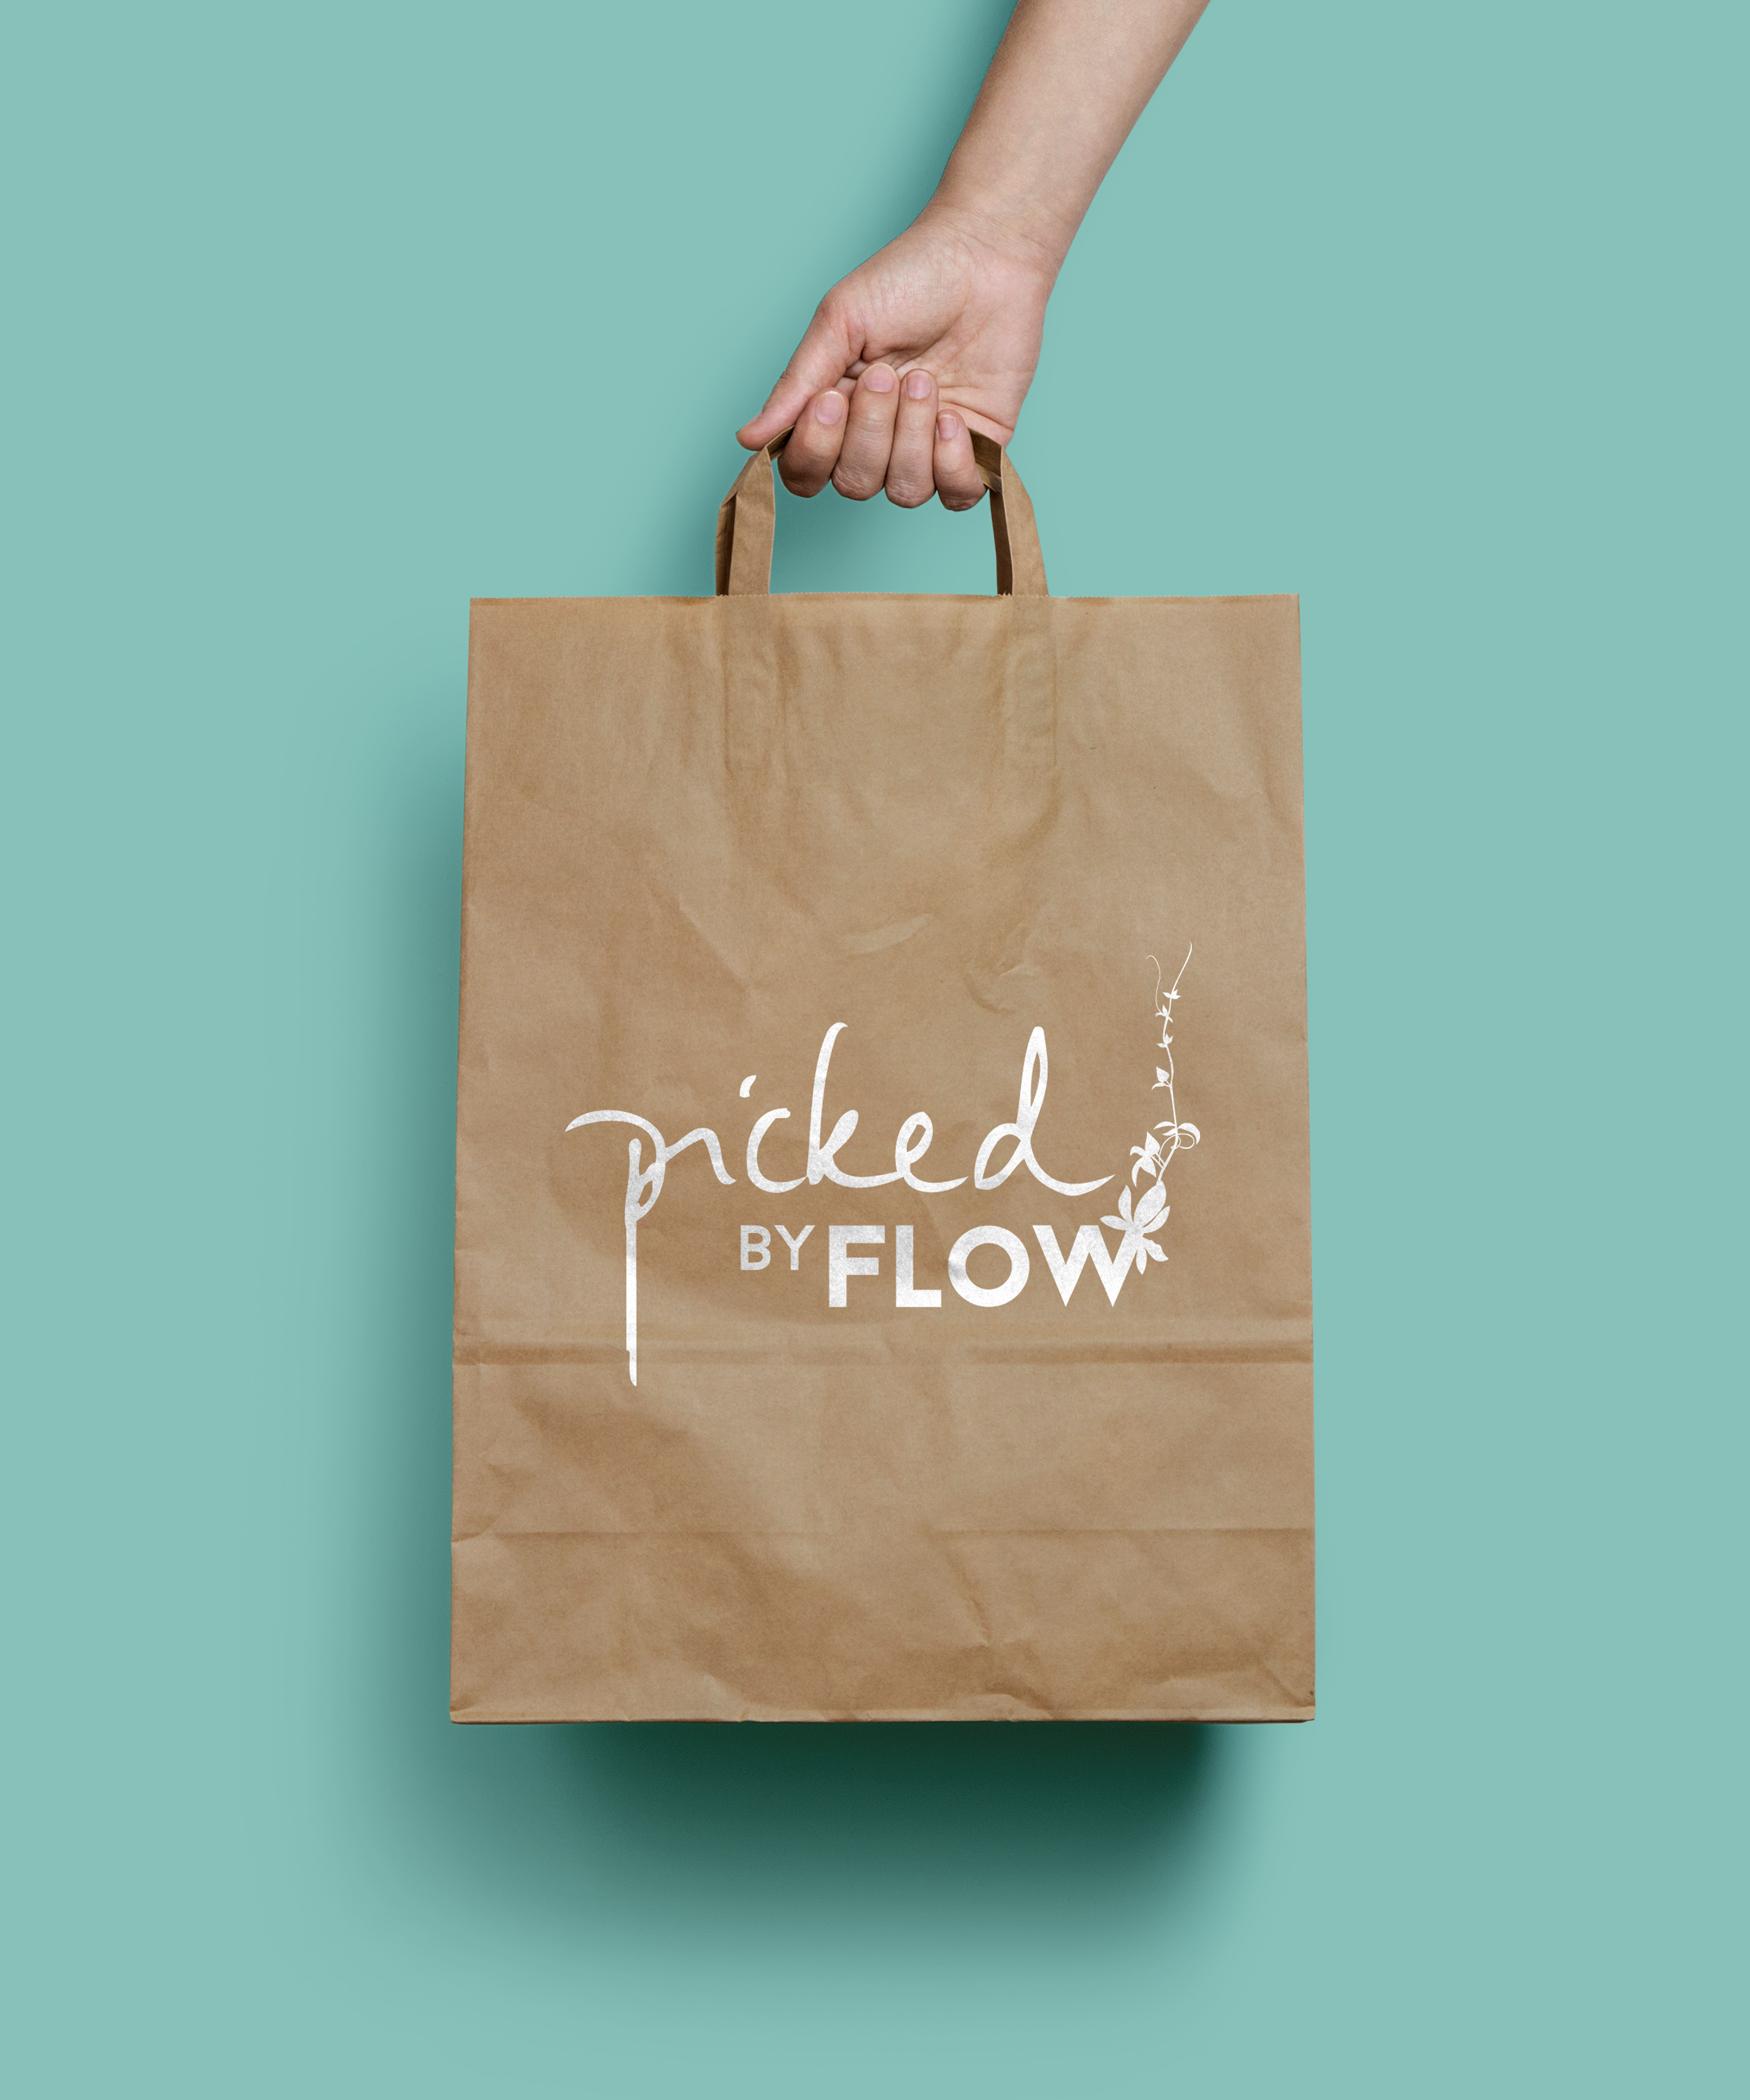 mockup_paperbag_flow_BIG.jpg